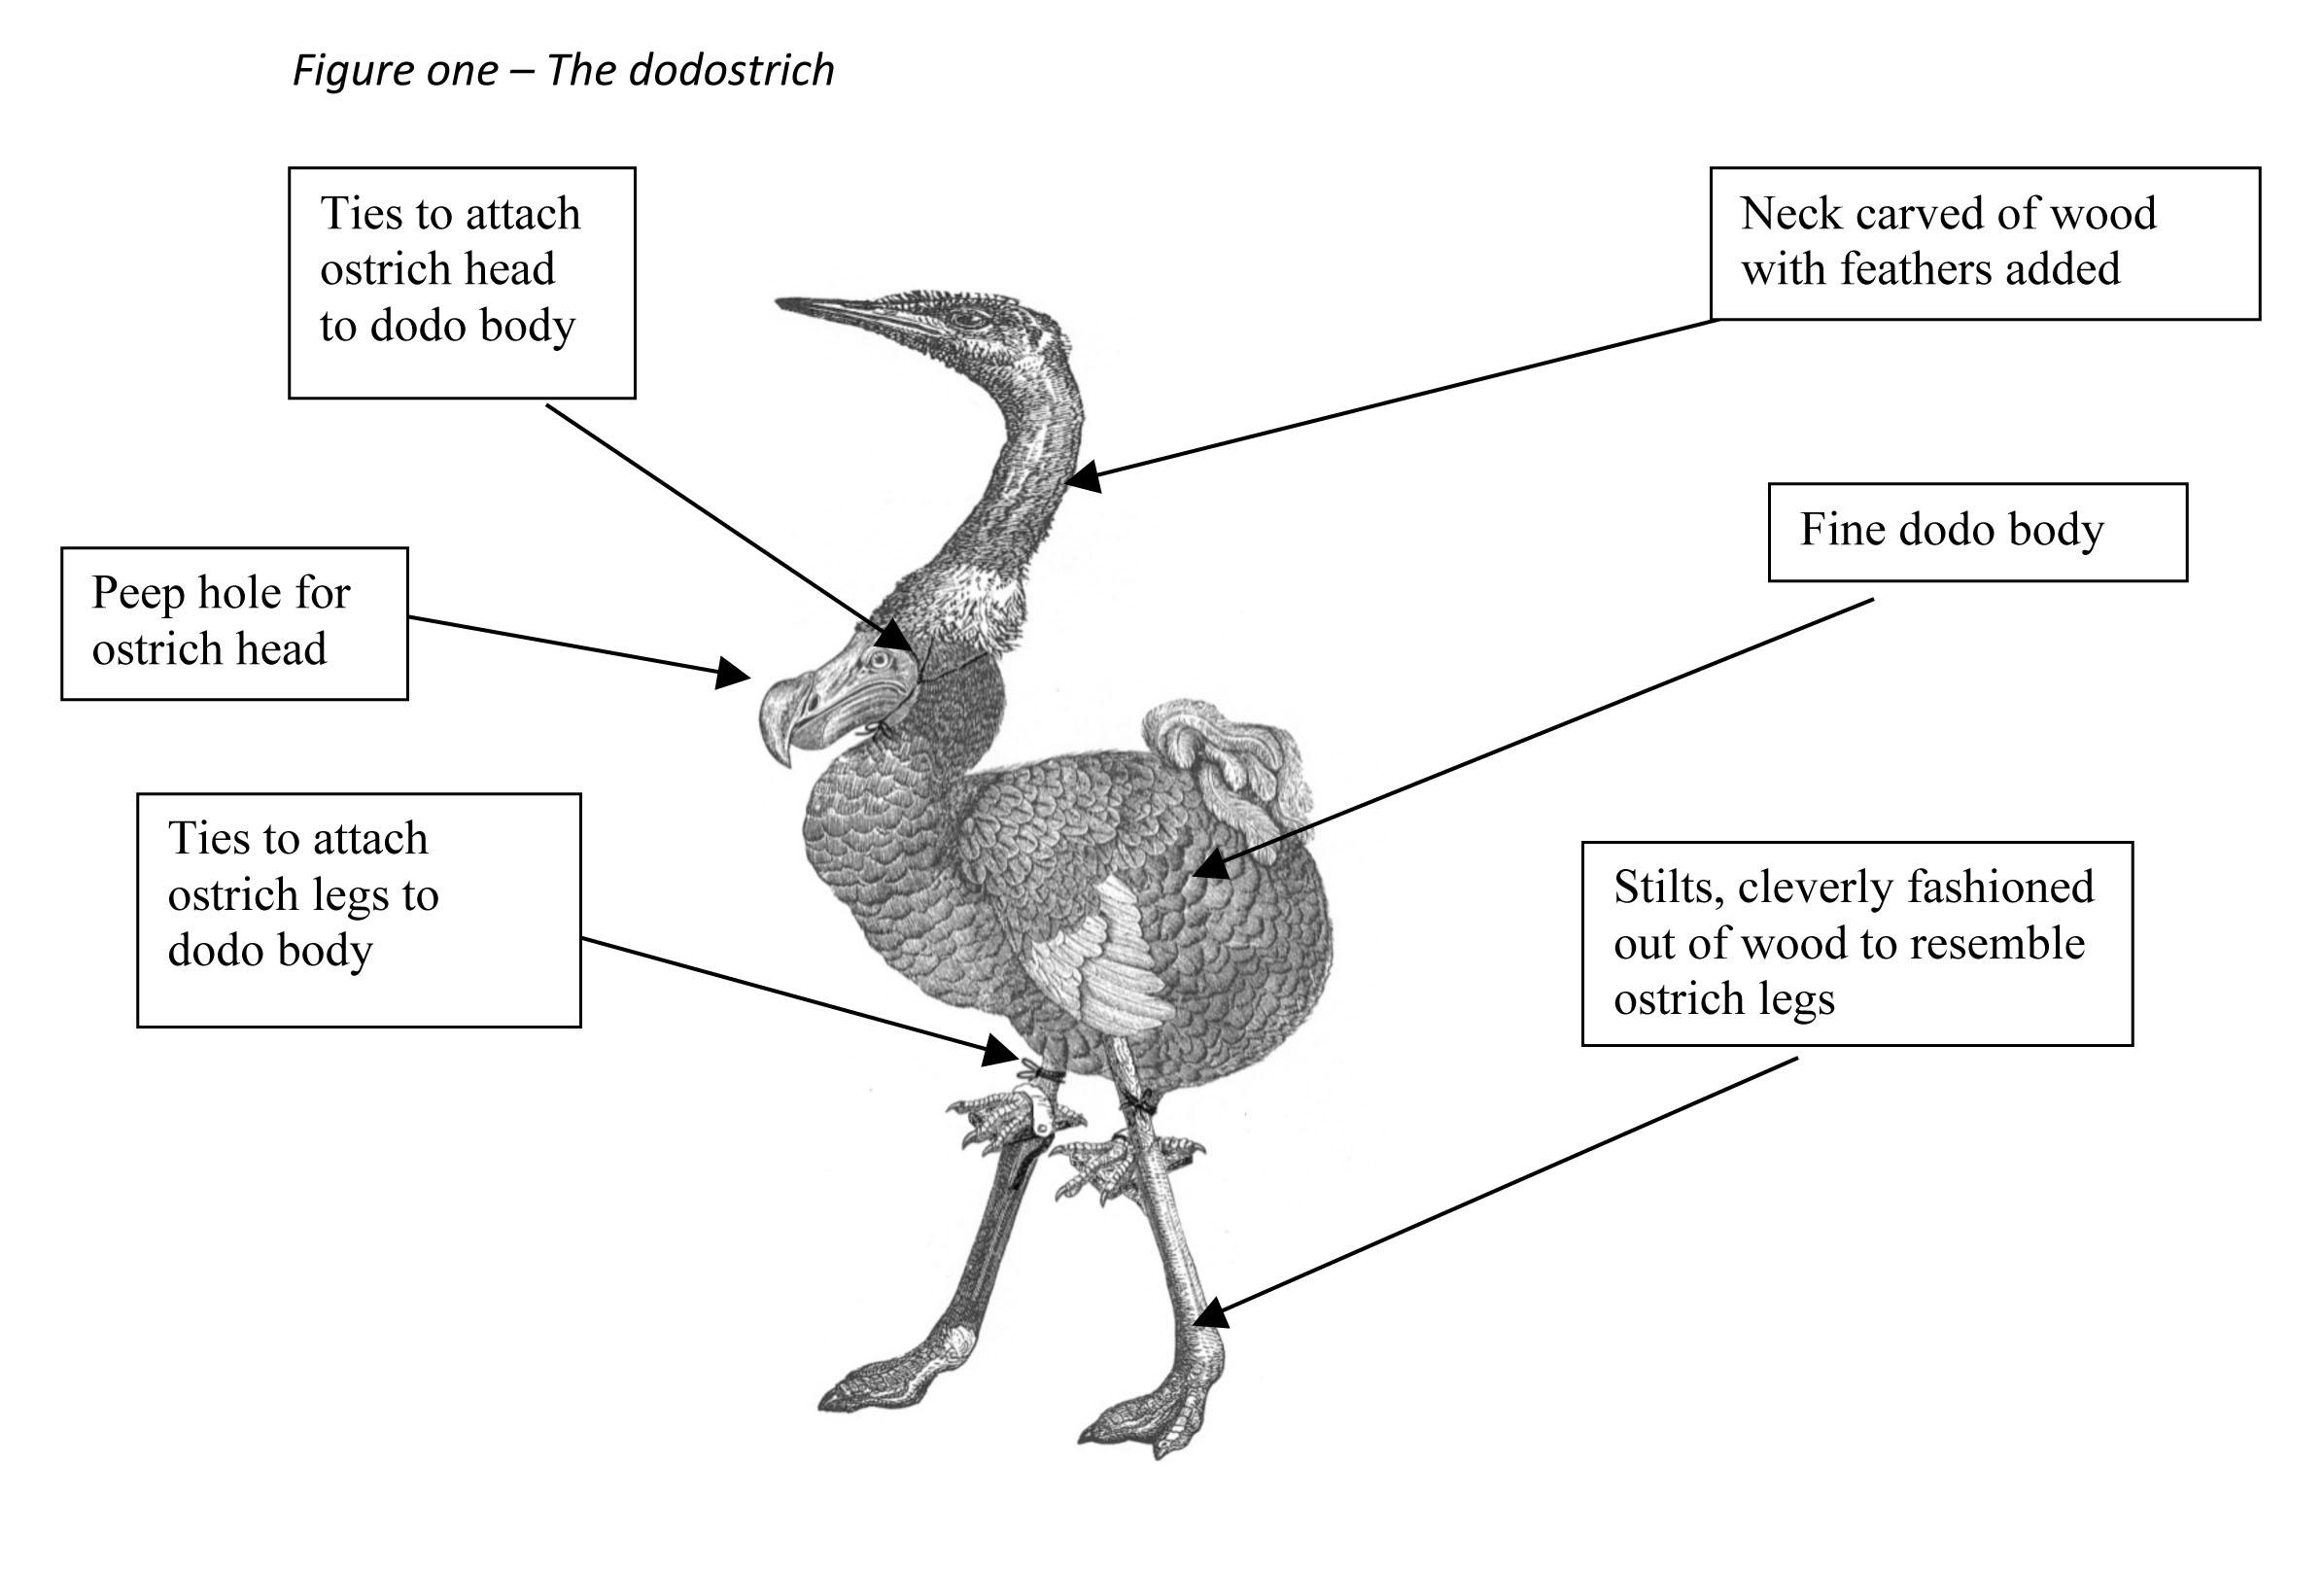 ostrich skeleton diagram opel vectra c radio wiring turkey ribs bing images